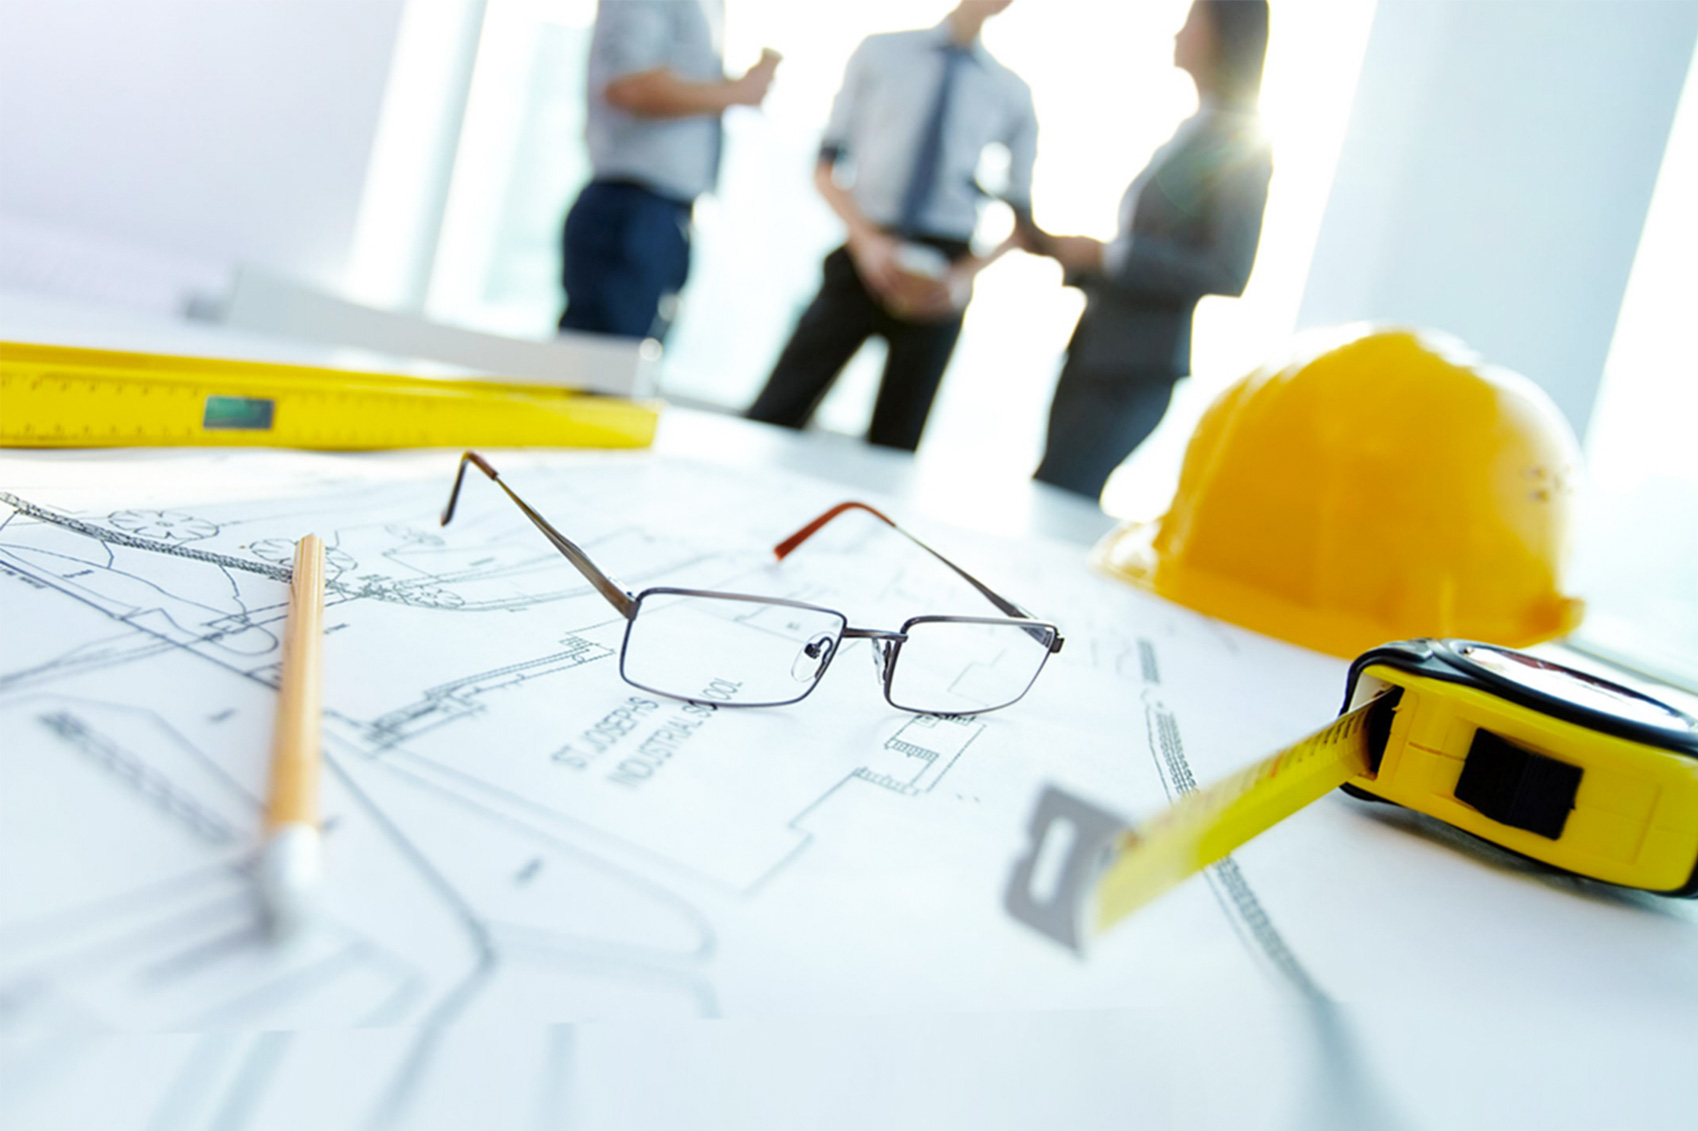 Renovari Firma de constructii Claris Con